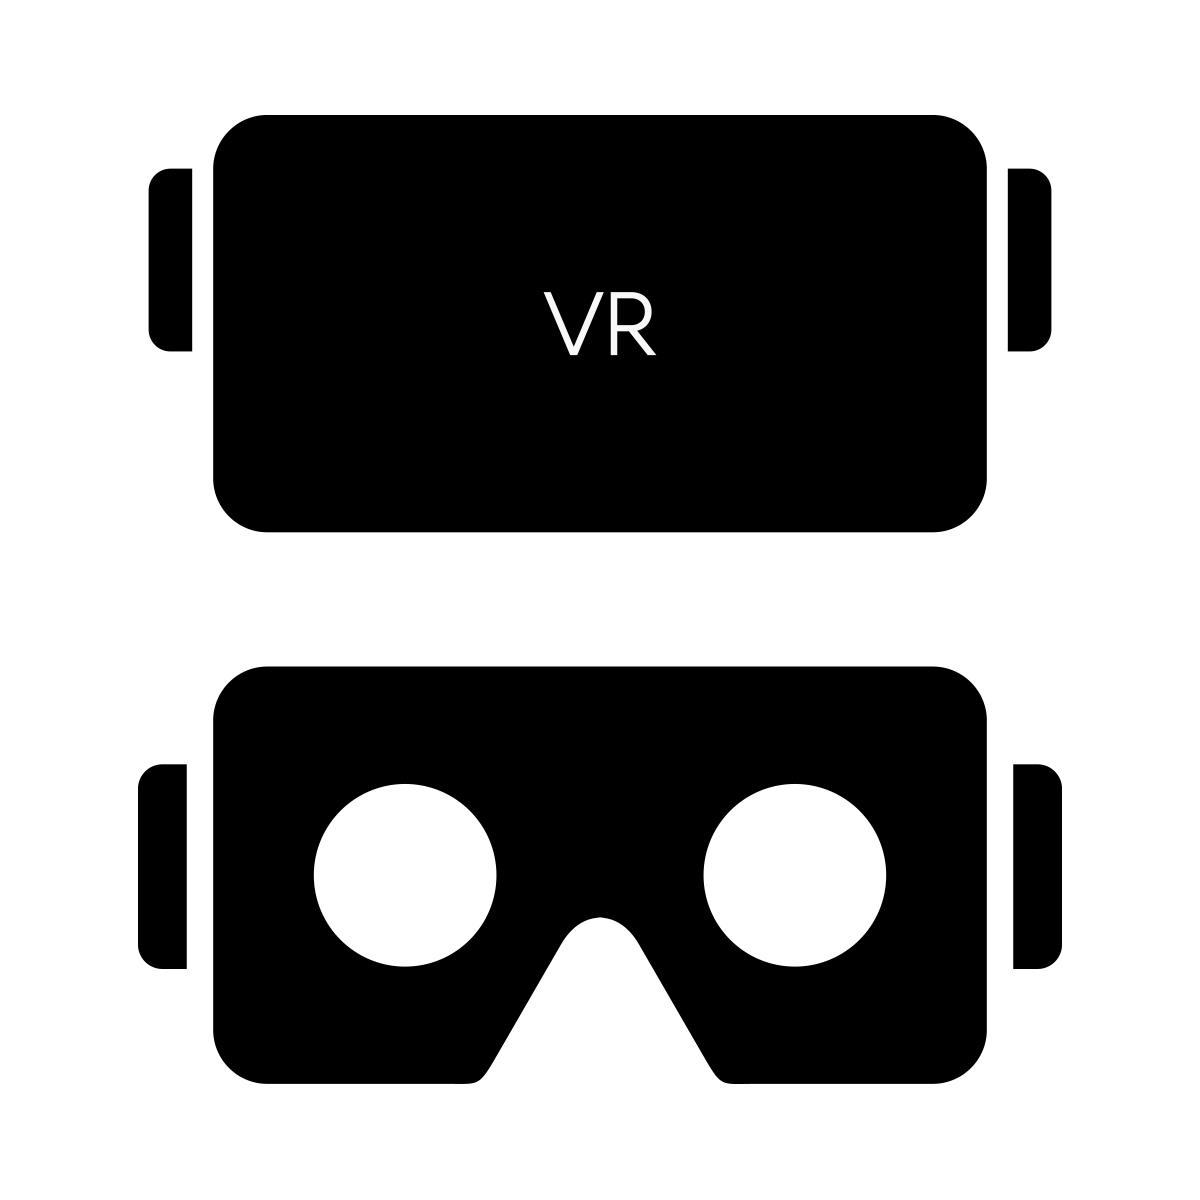 360° / VR